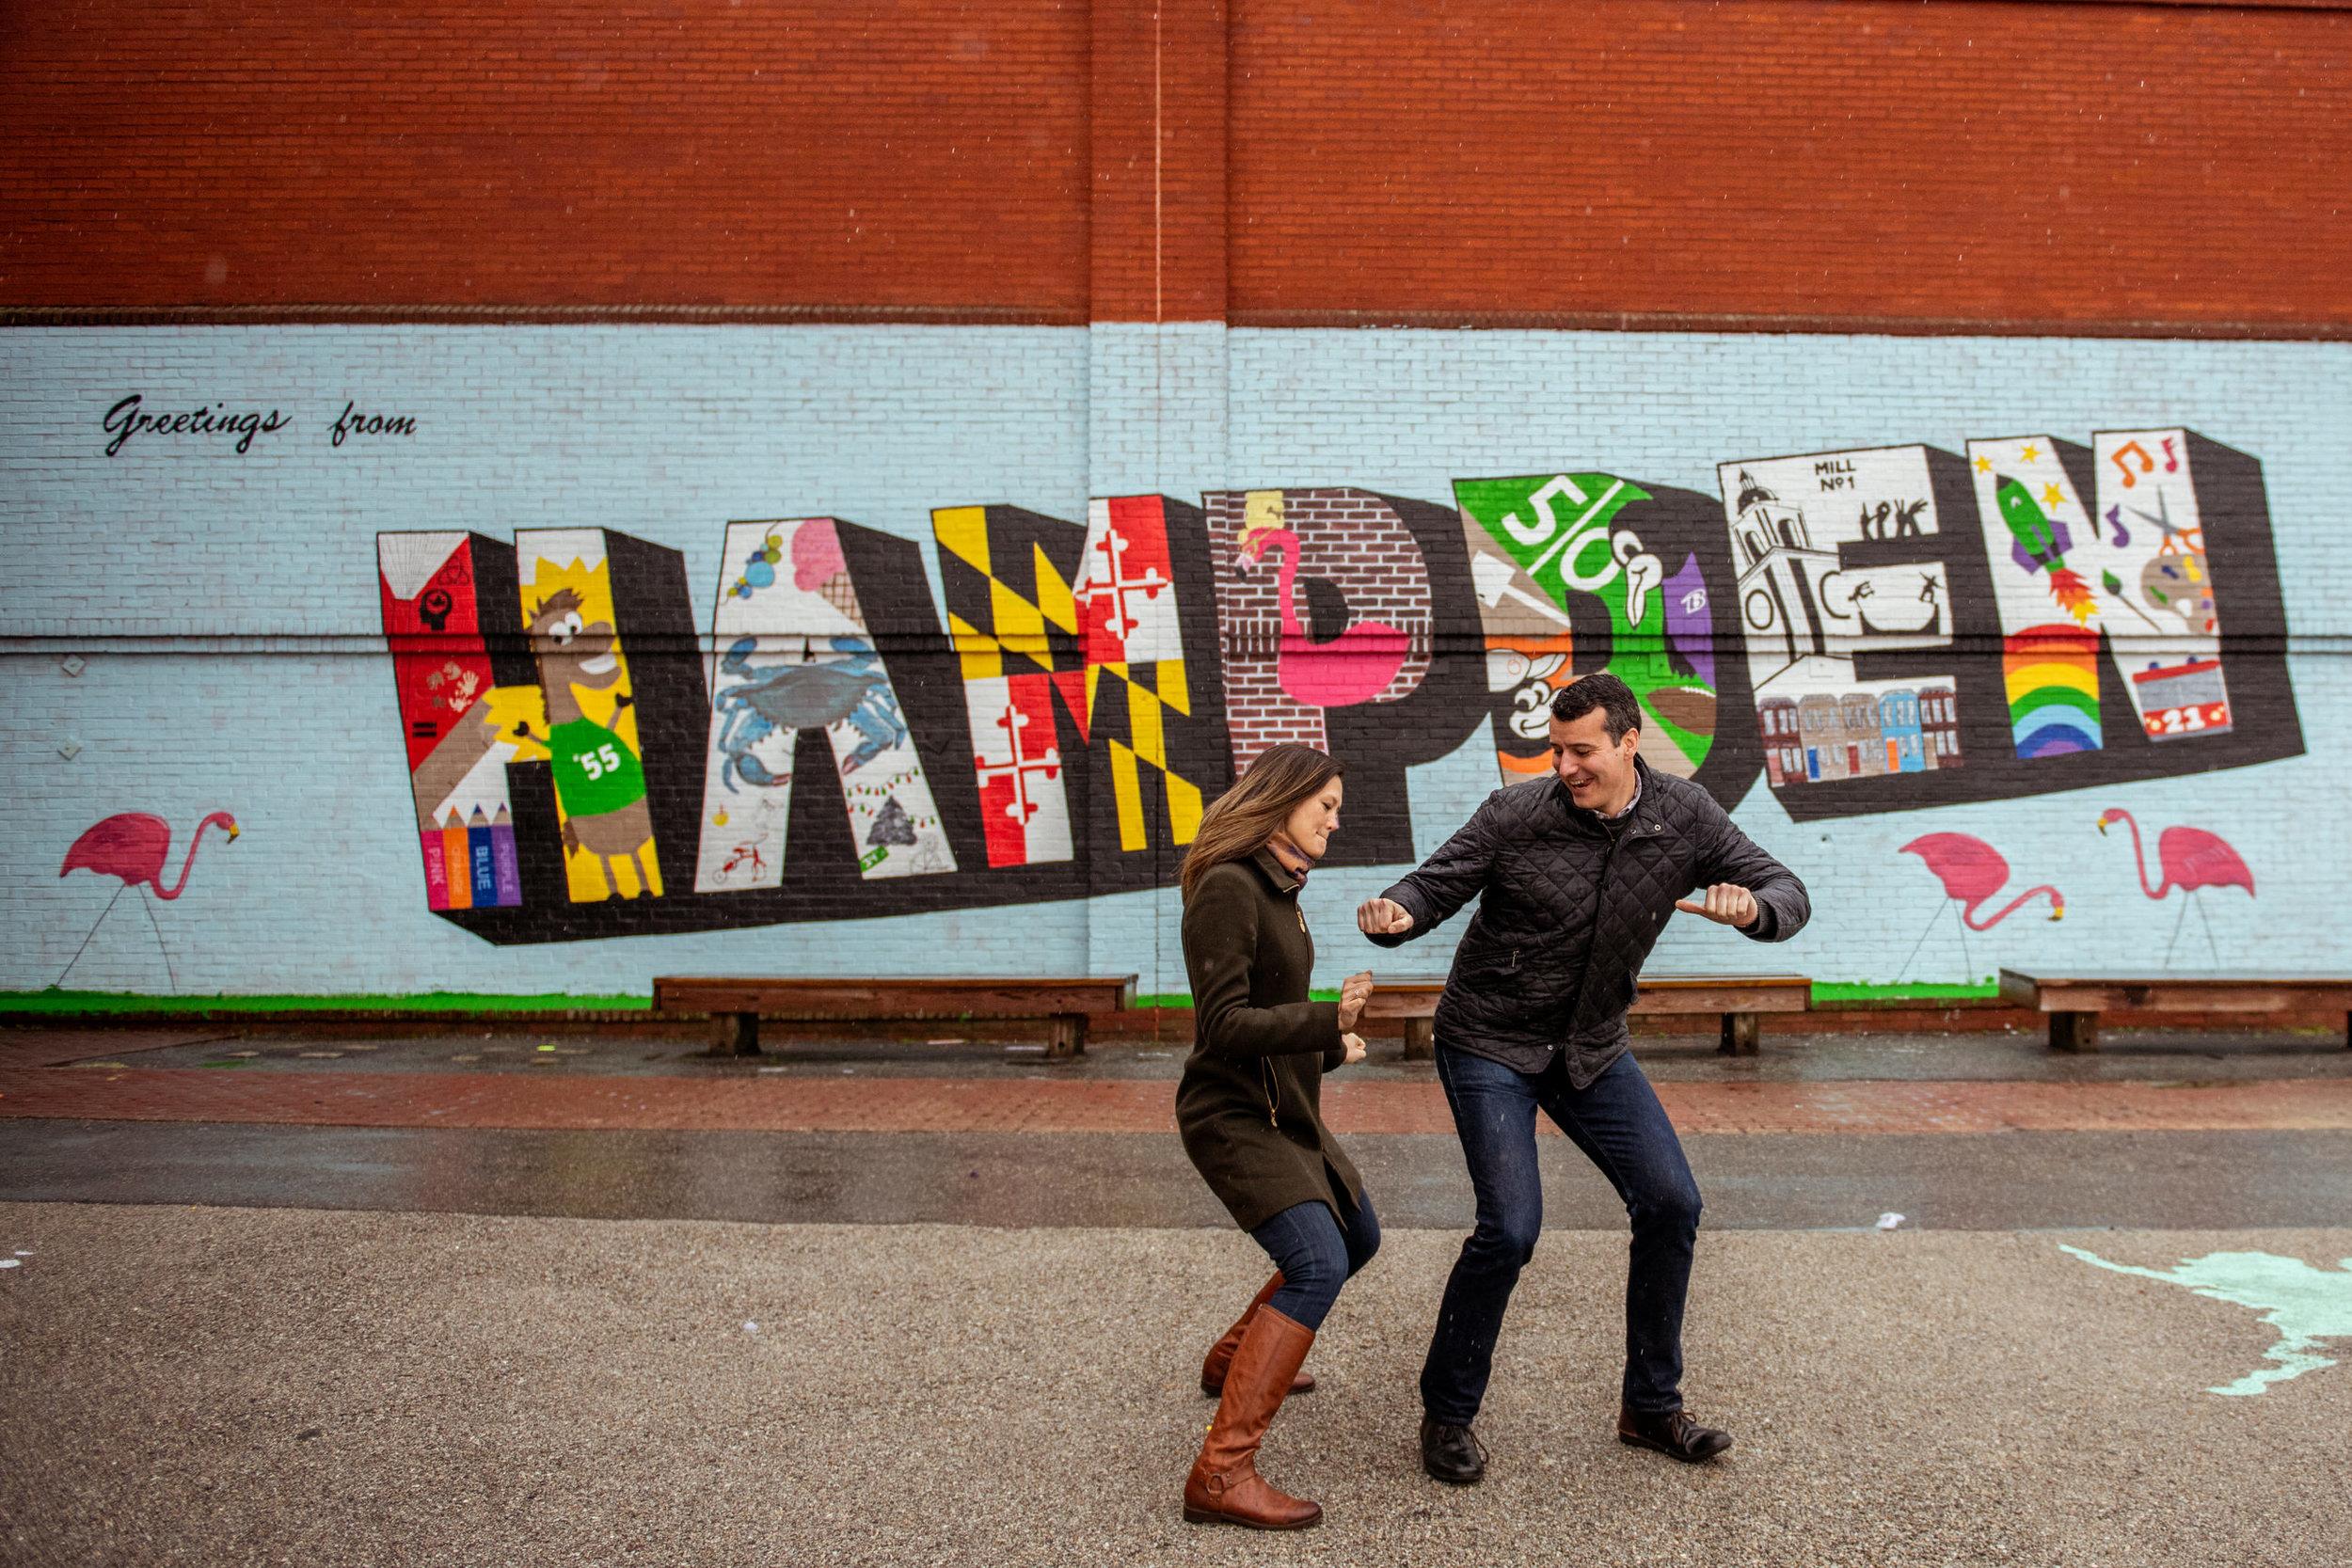 BaltimoreFoodieEngagement-Allison&Patrick-256.jpg